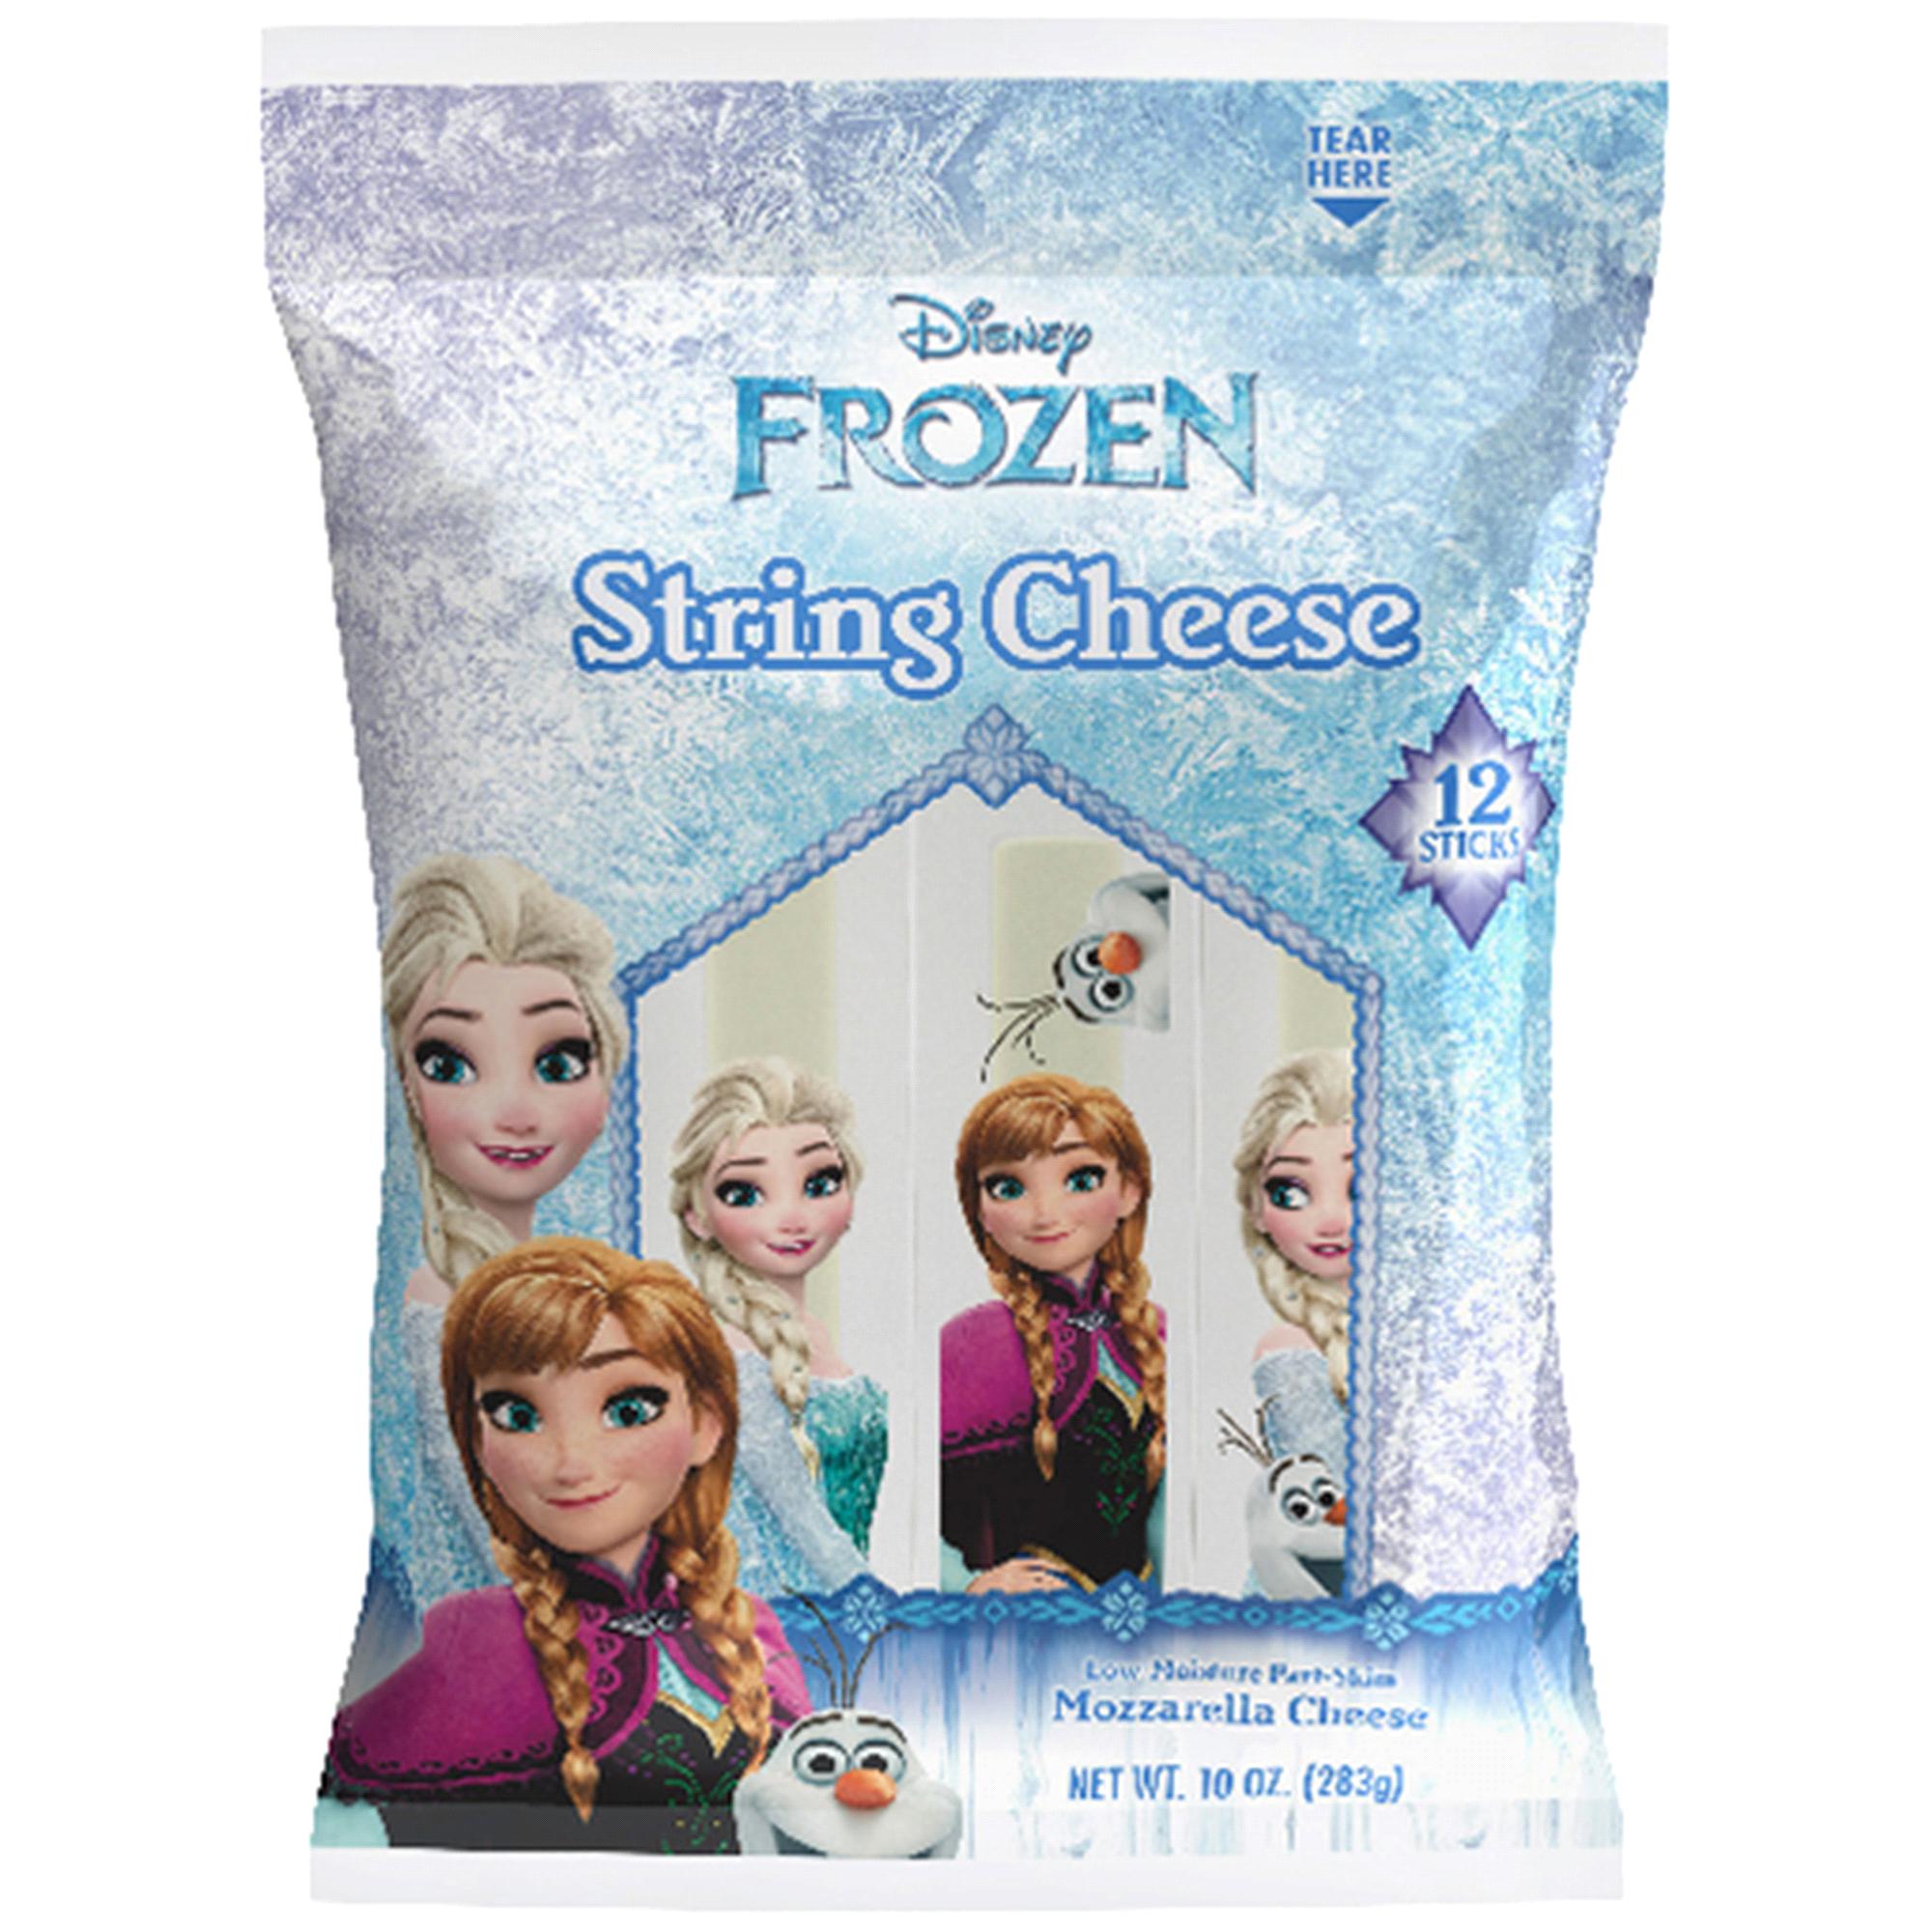 Disney Frozen Mozzarella String Cheese 10 oz 12 ct   Meijer.com